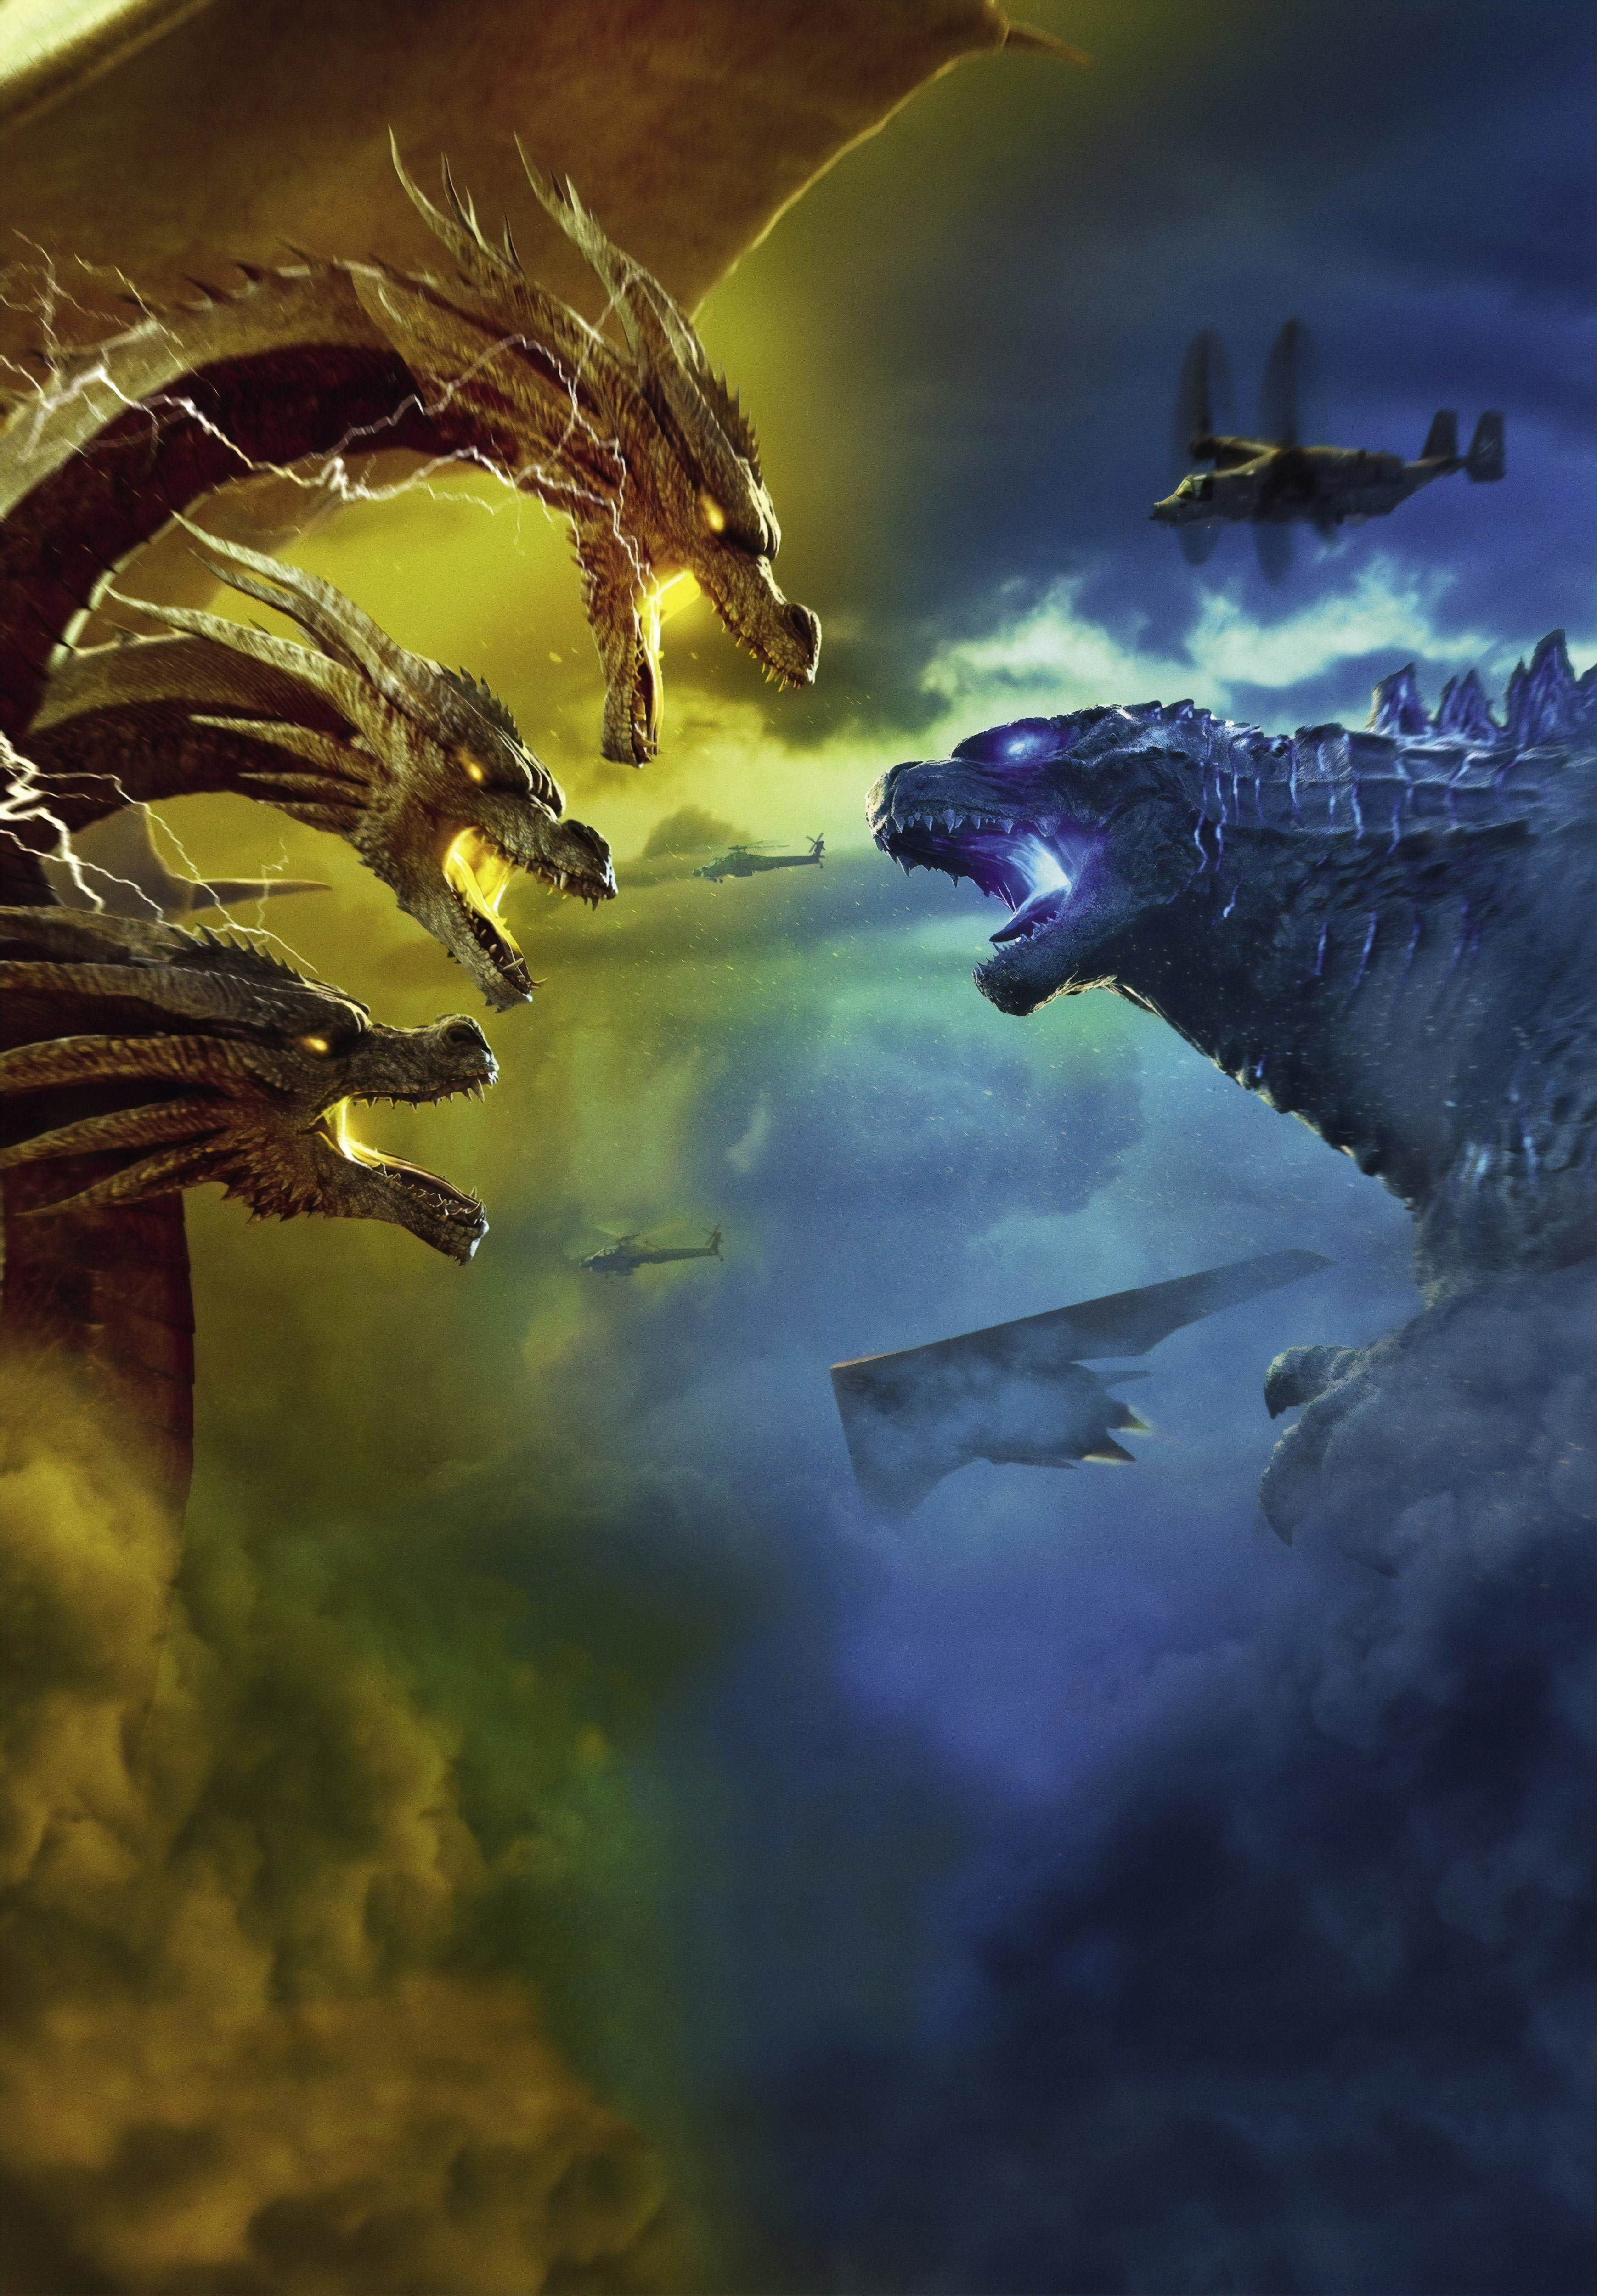 Godzilla King of the Monsters 4K Wallpaper, HD Movies 4K ...